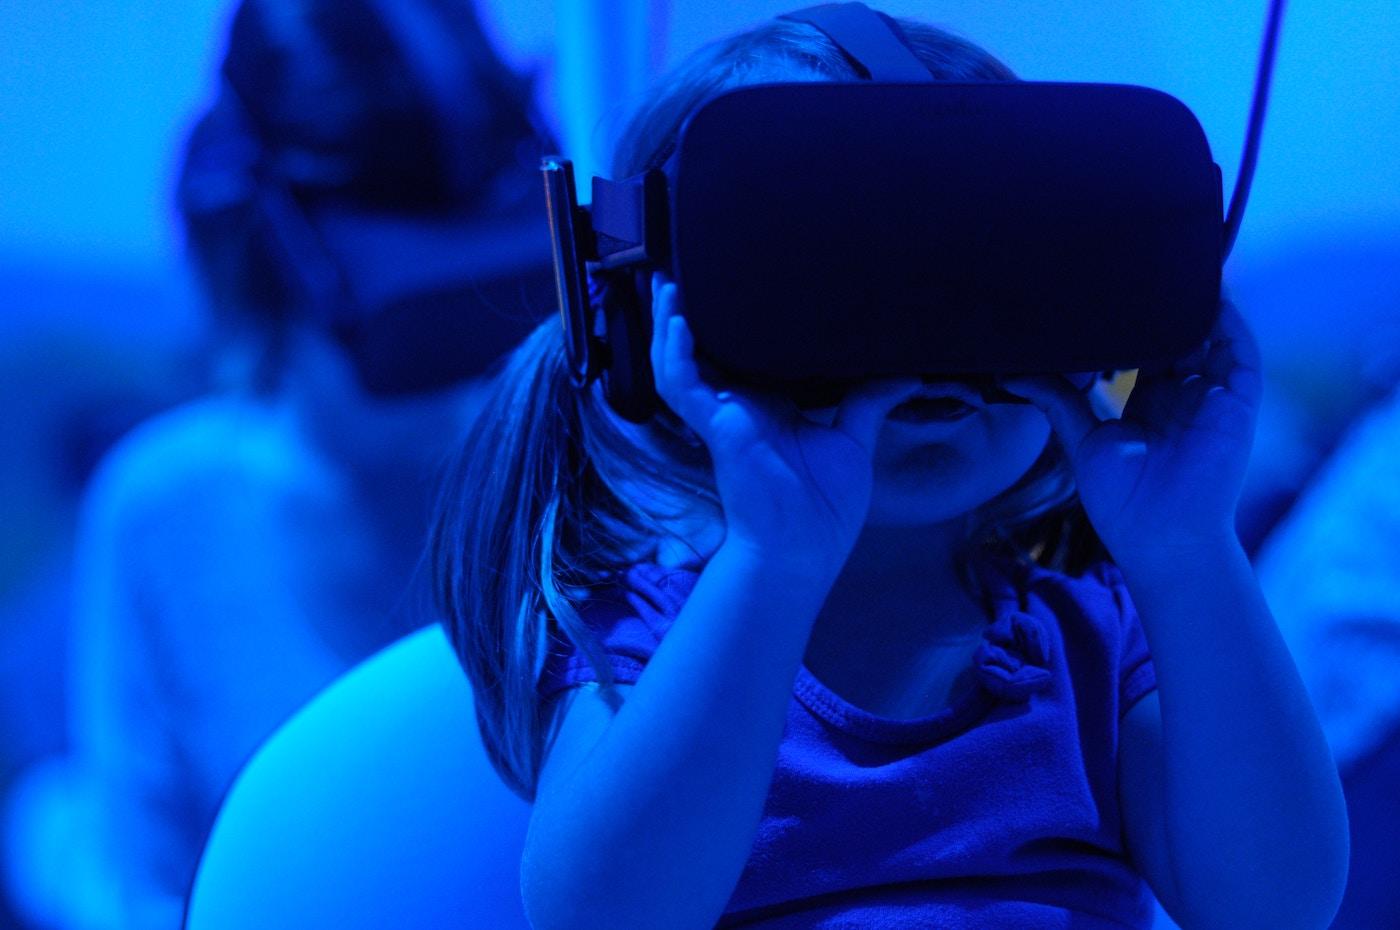 3D Audio Virtual Reality